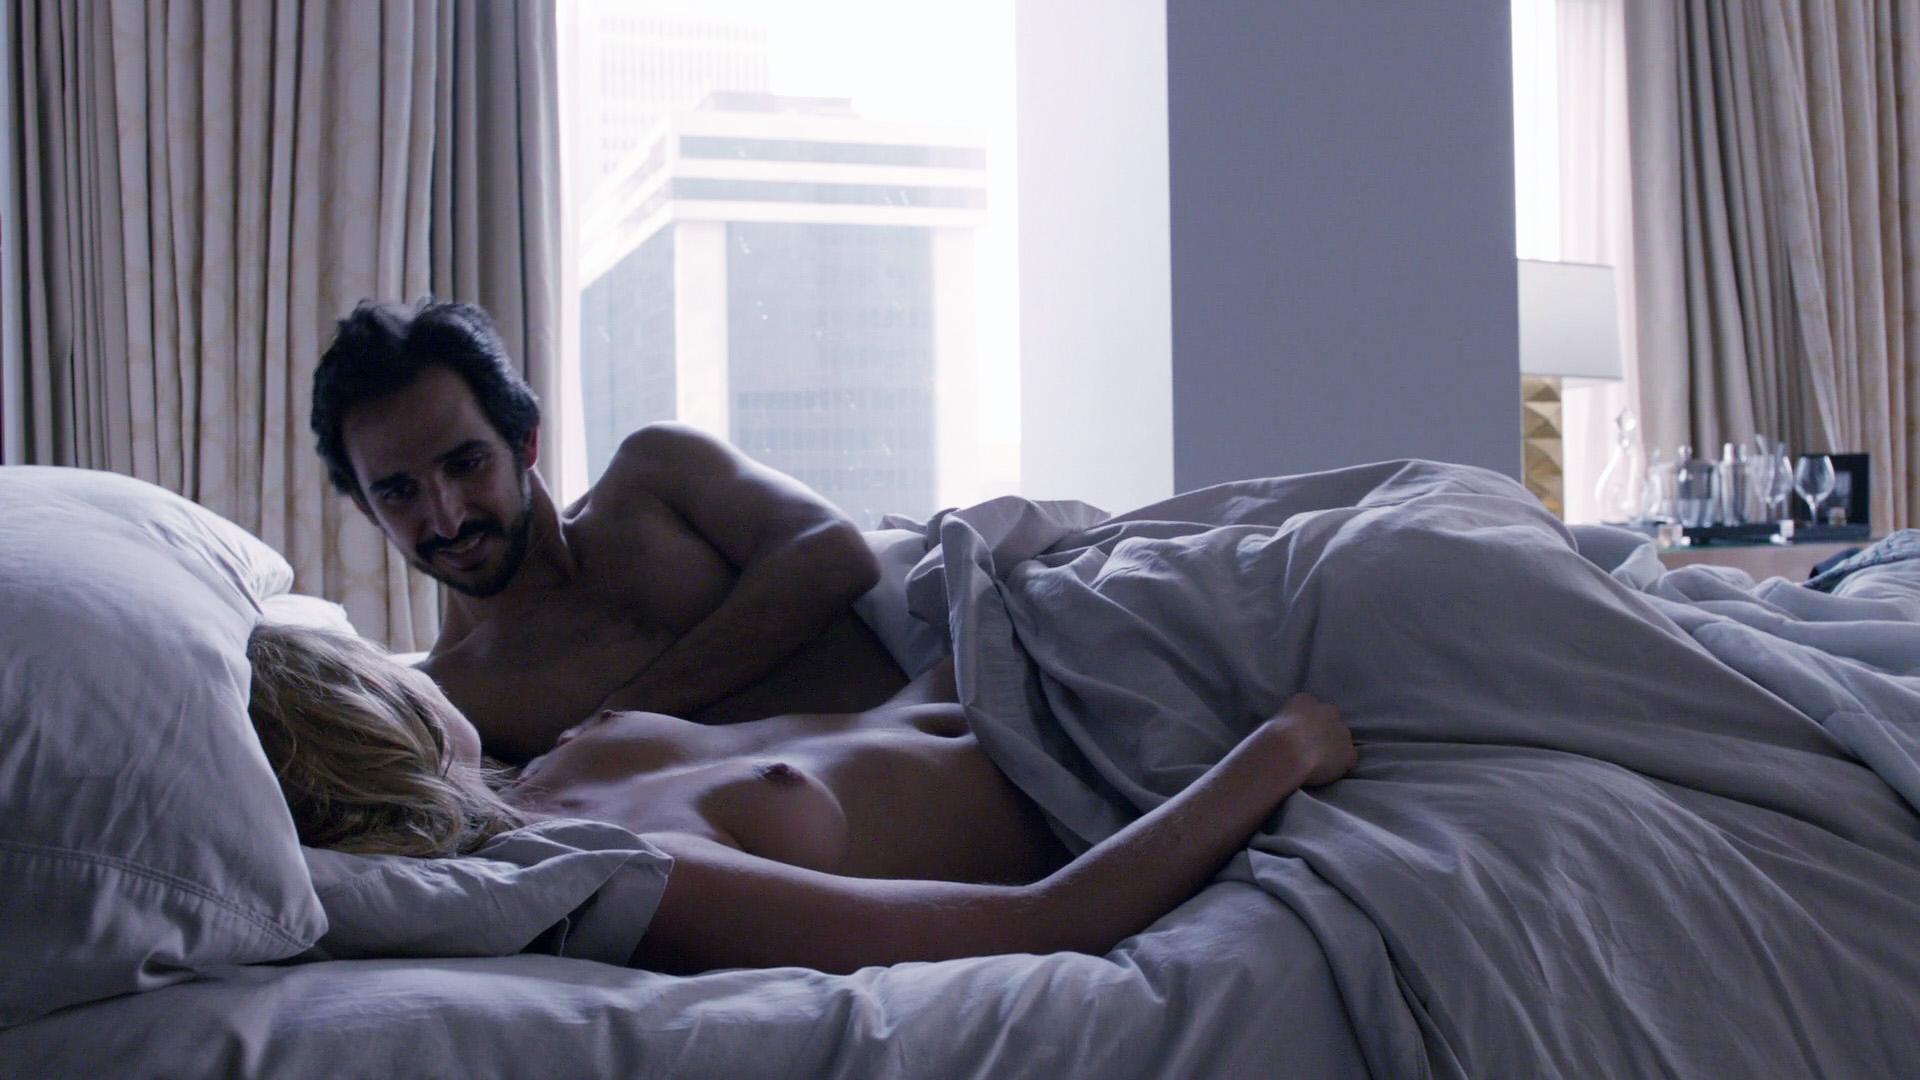 Photos of naked costa rican women